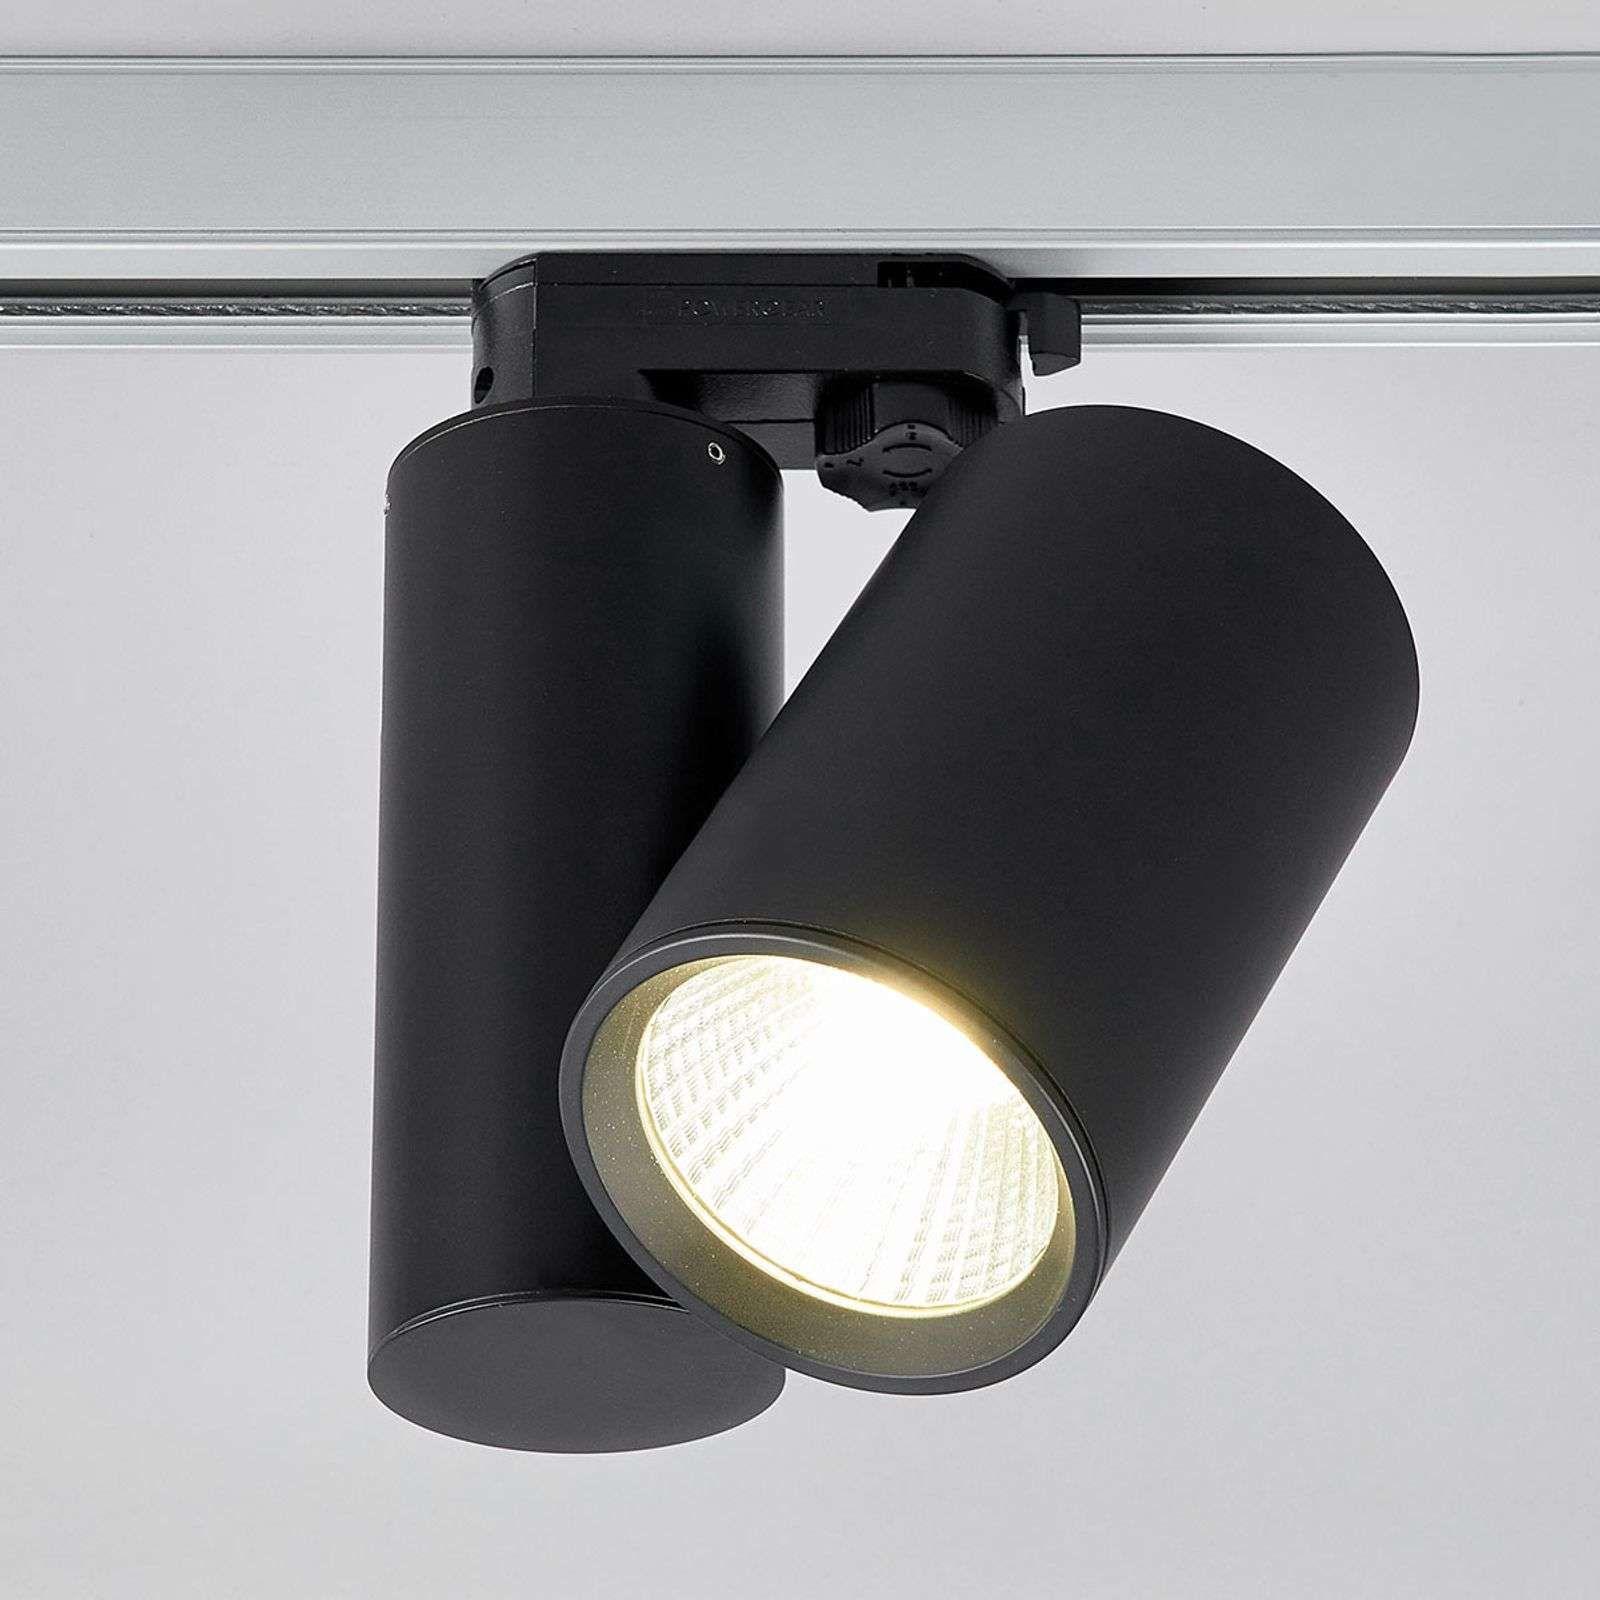 Spot Led Giol Noir Pour Systeme De Rails Led Verlichtingsrails Badkamer Verlichting